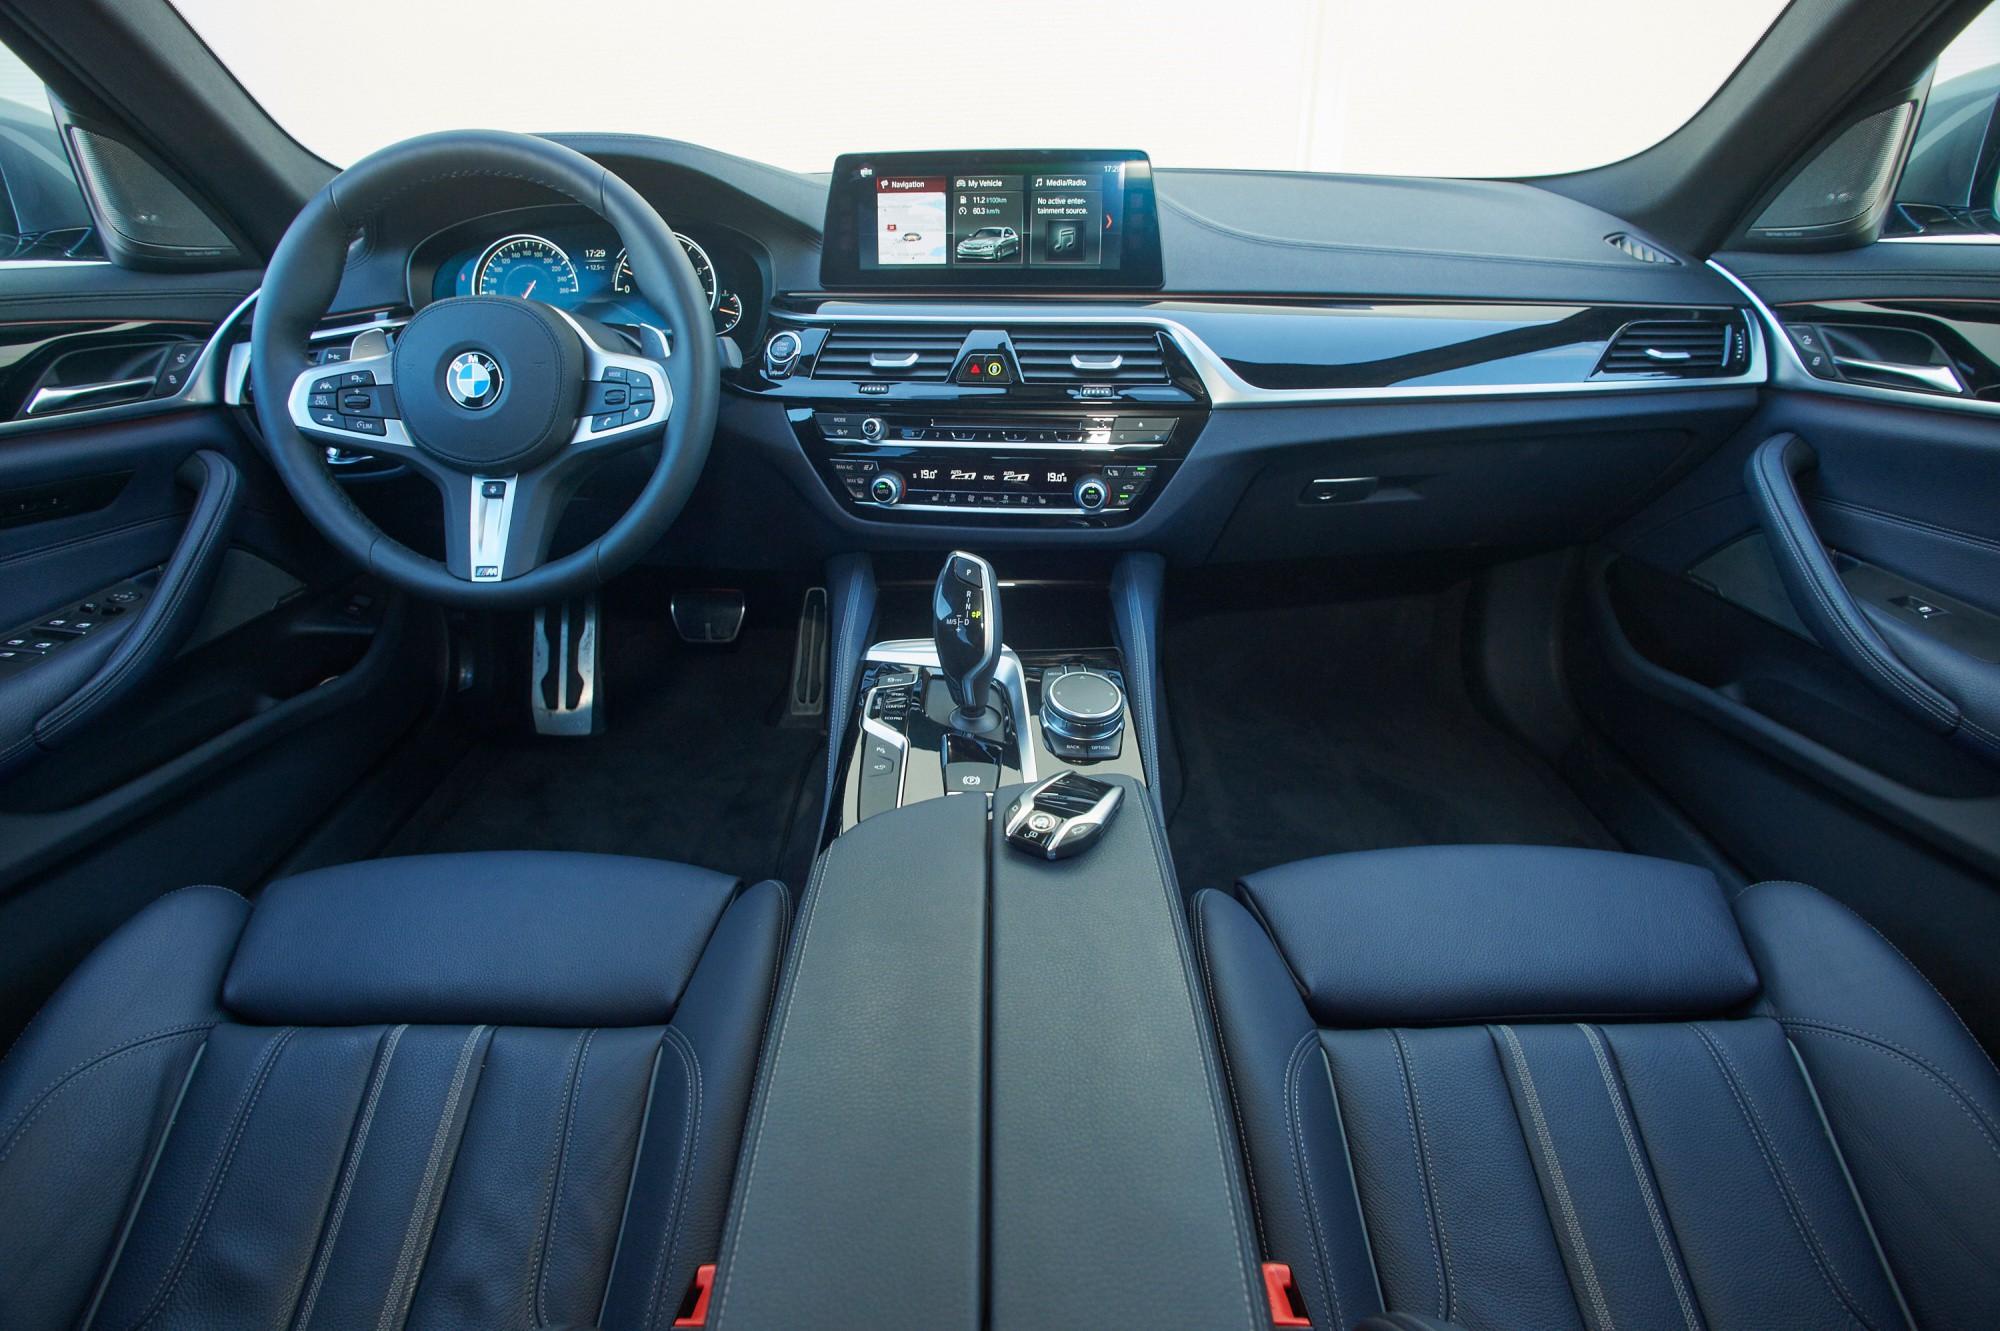 2017 Bmw 540i Xdrive M Sport Test Drive The Quintessential 5 Series